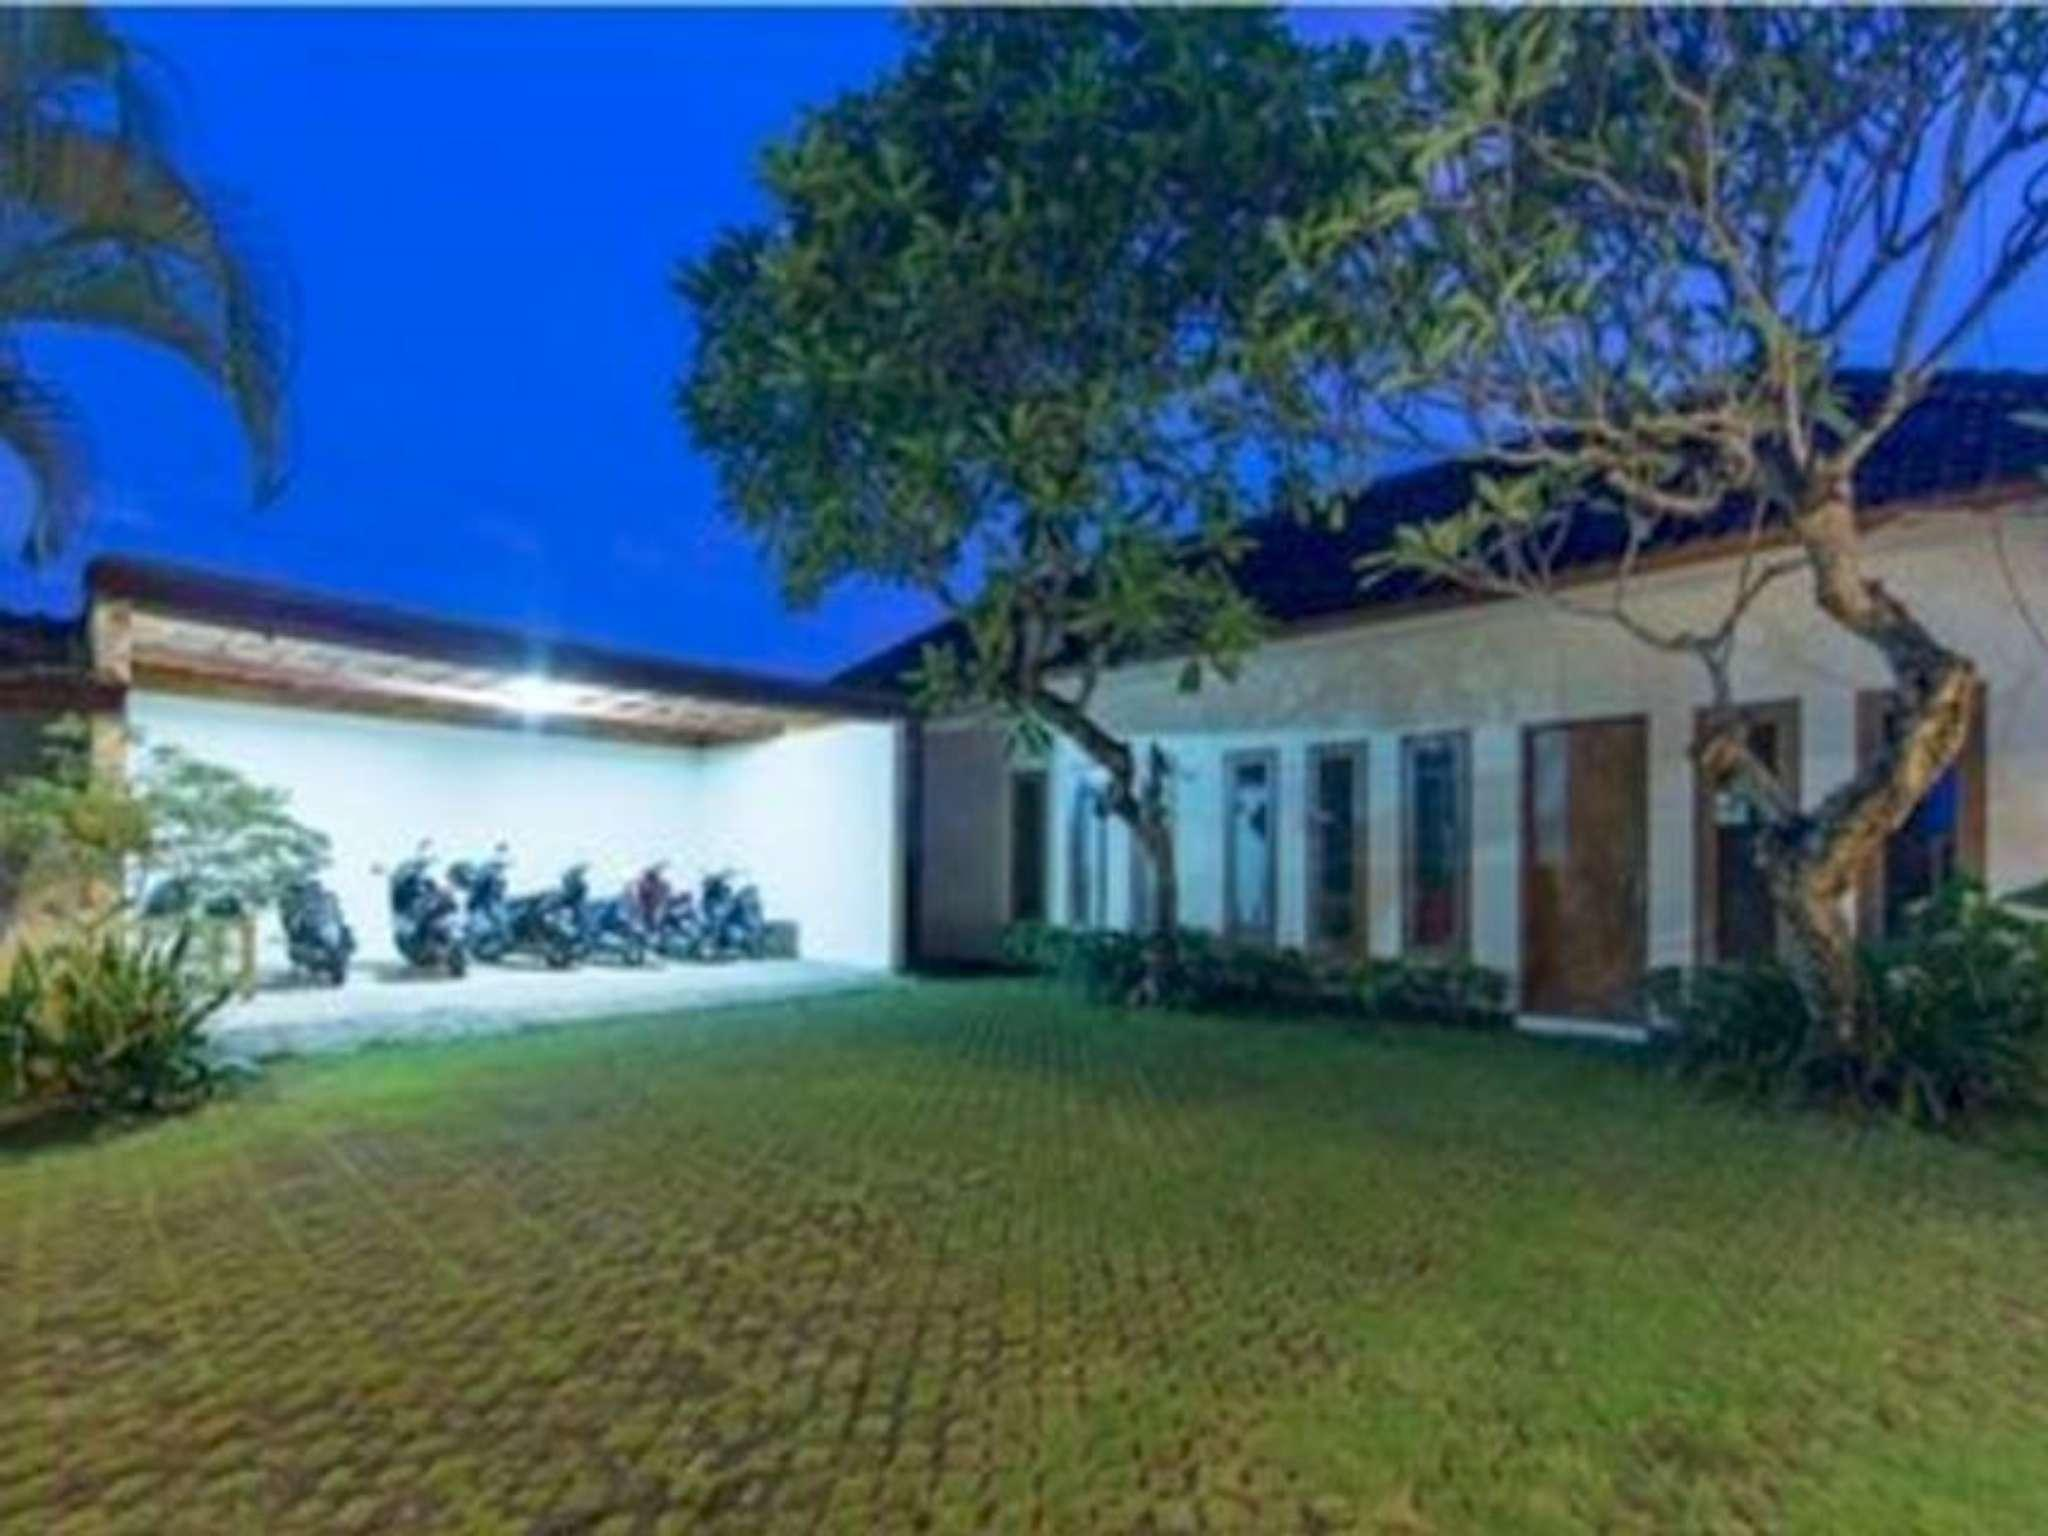 5 Bedroom Huge Villa With Playground In Canggu